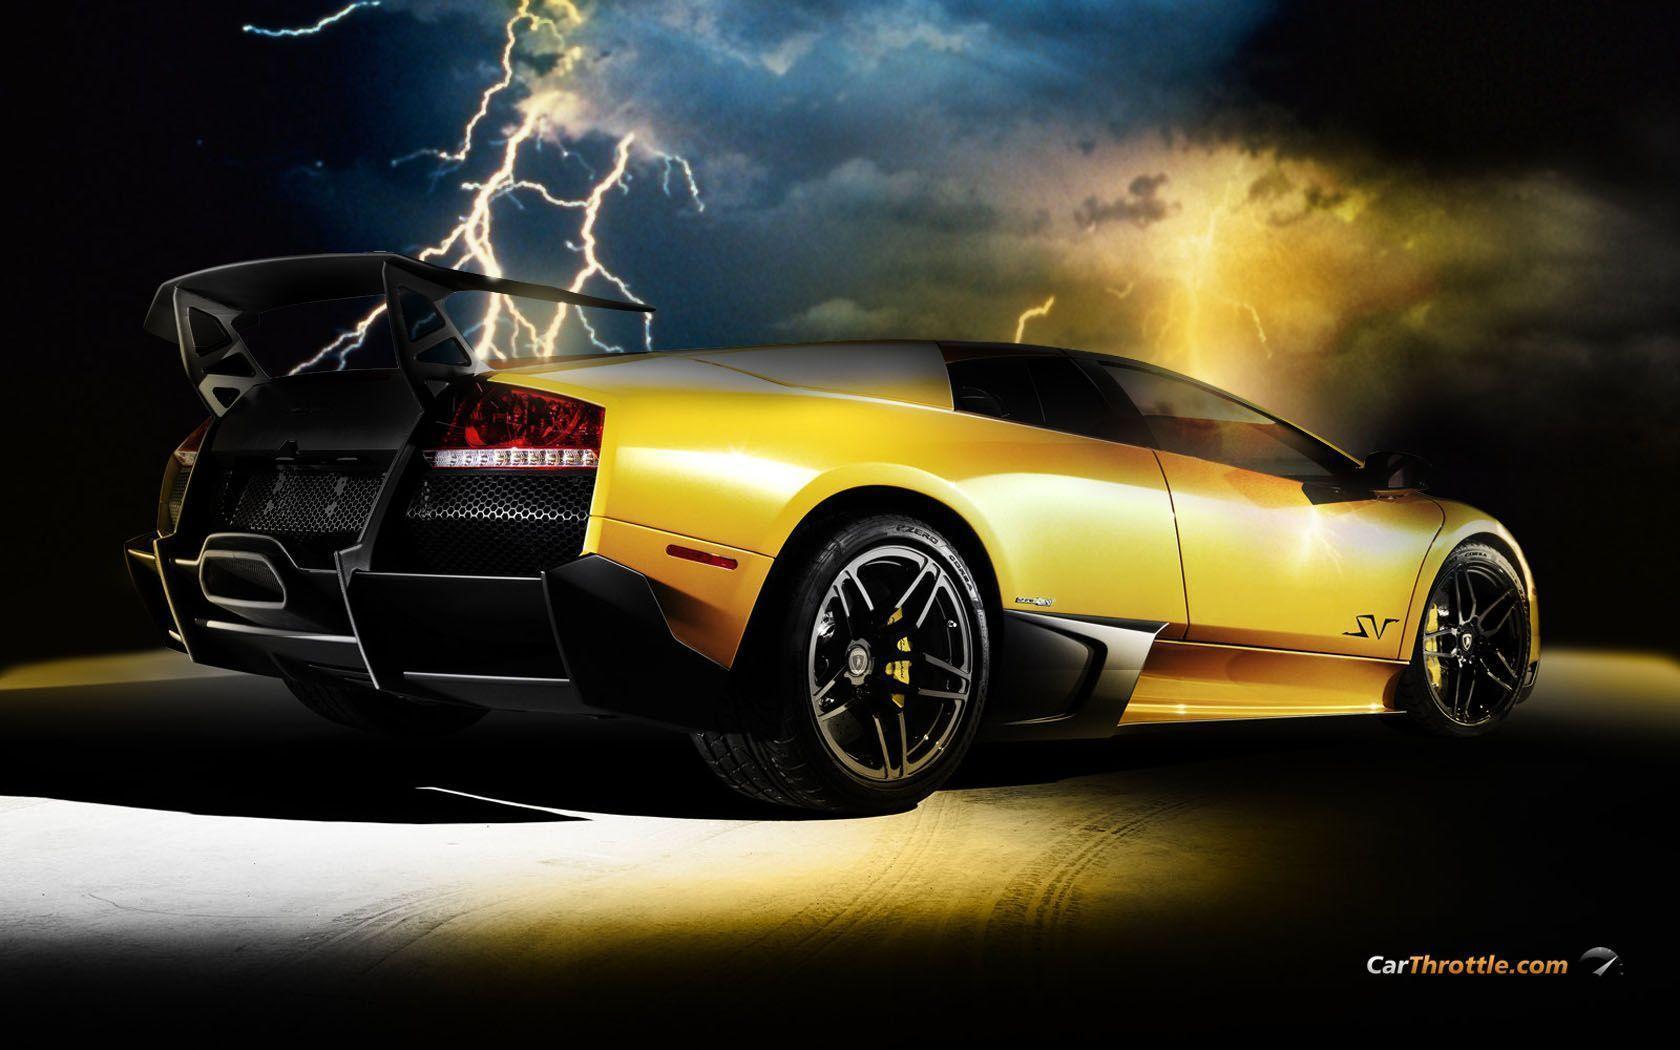 Lamborghini wallpapers | Lamborghini background - Page 24